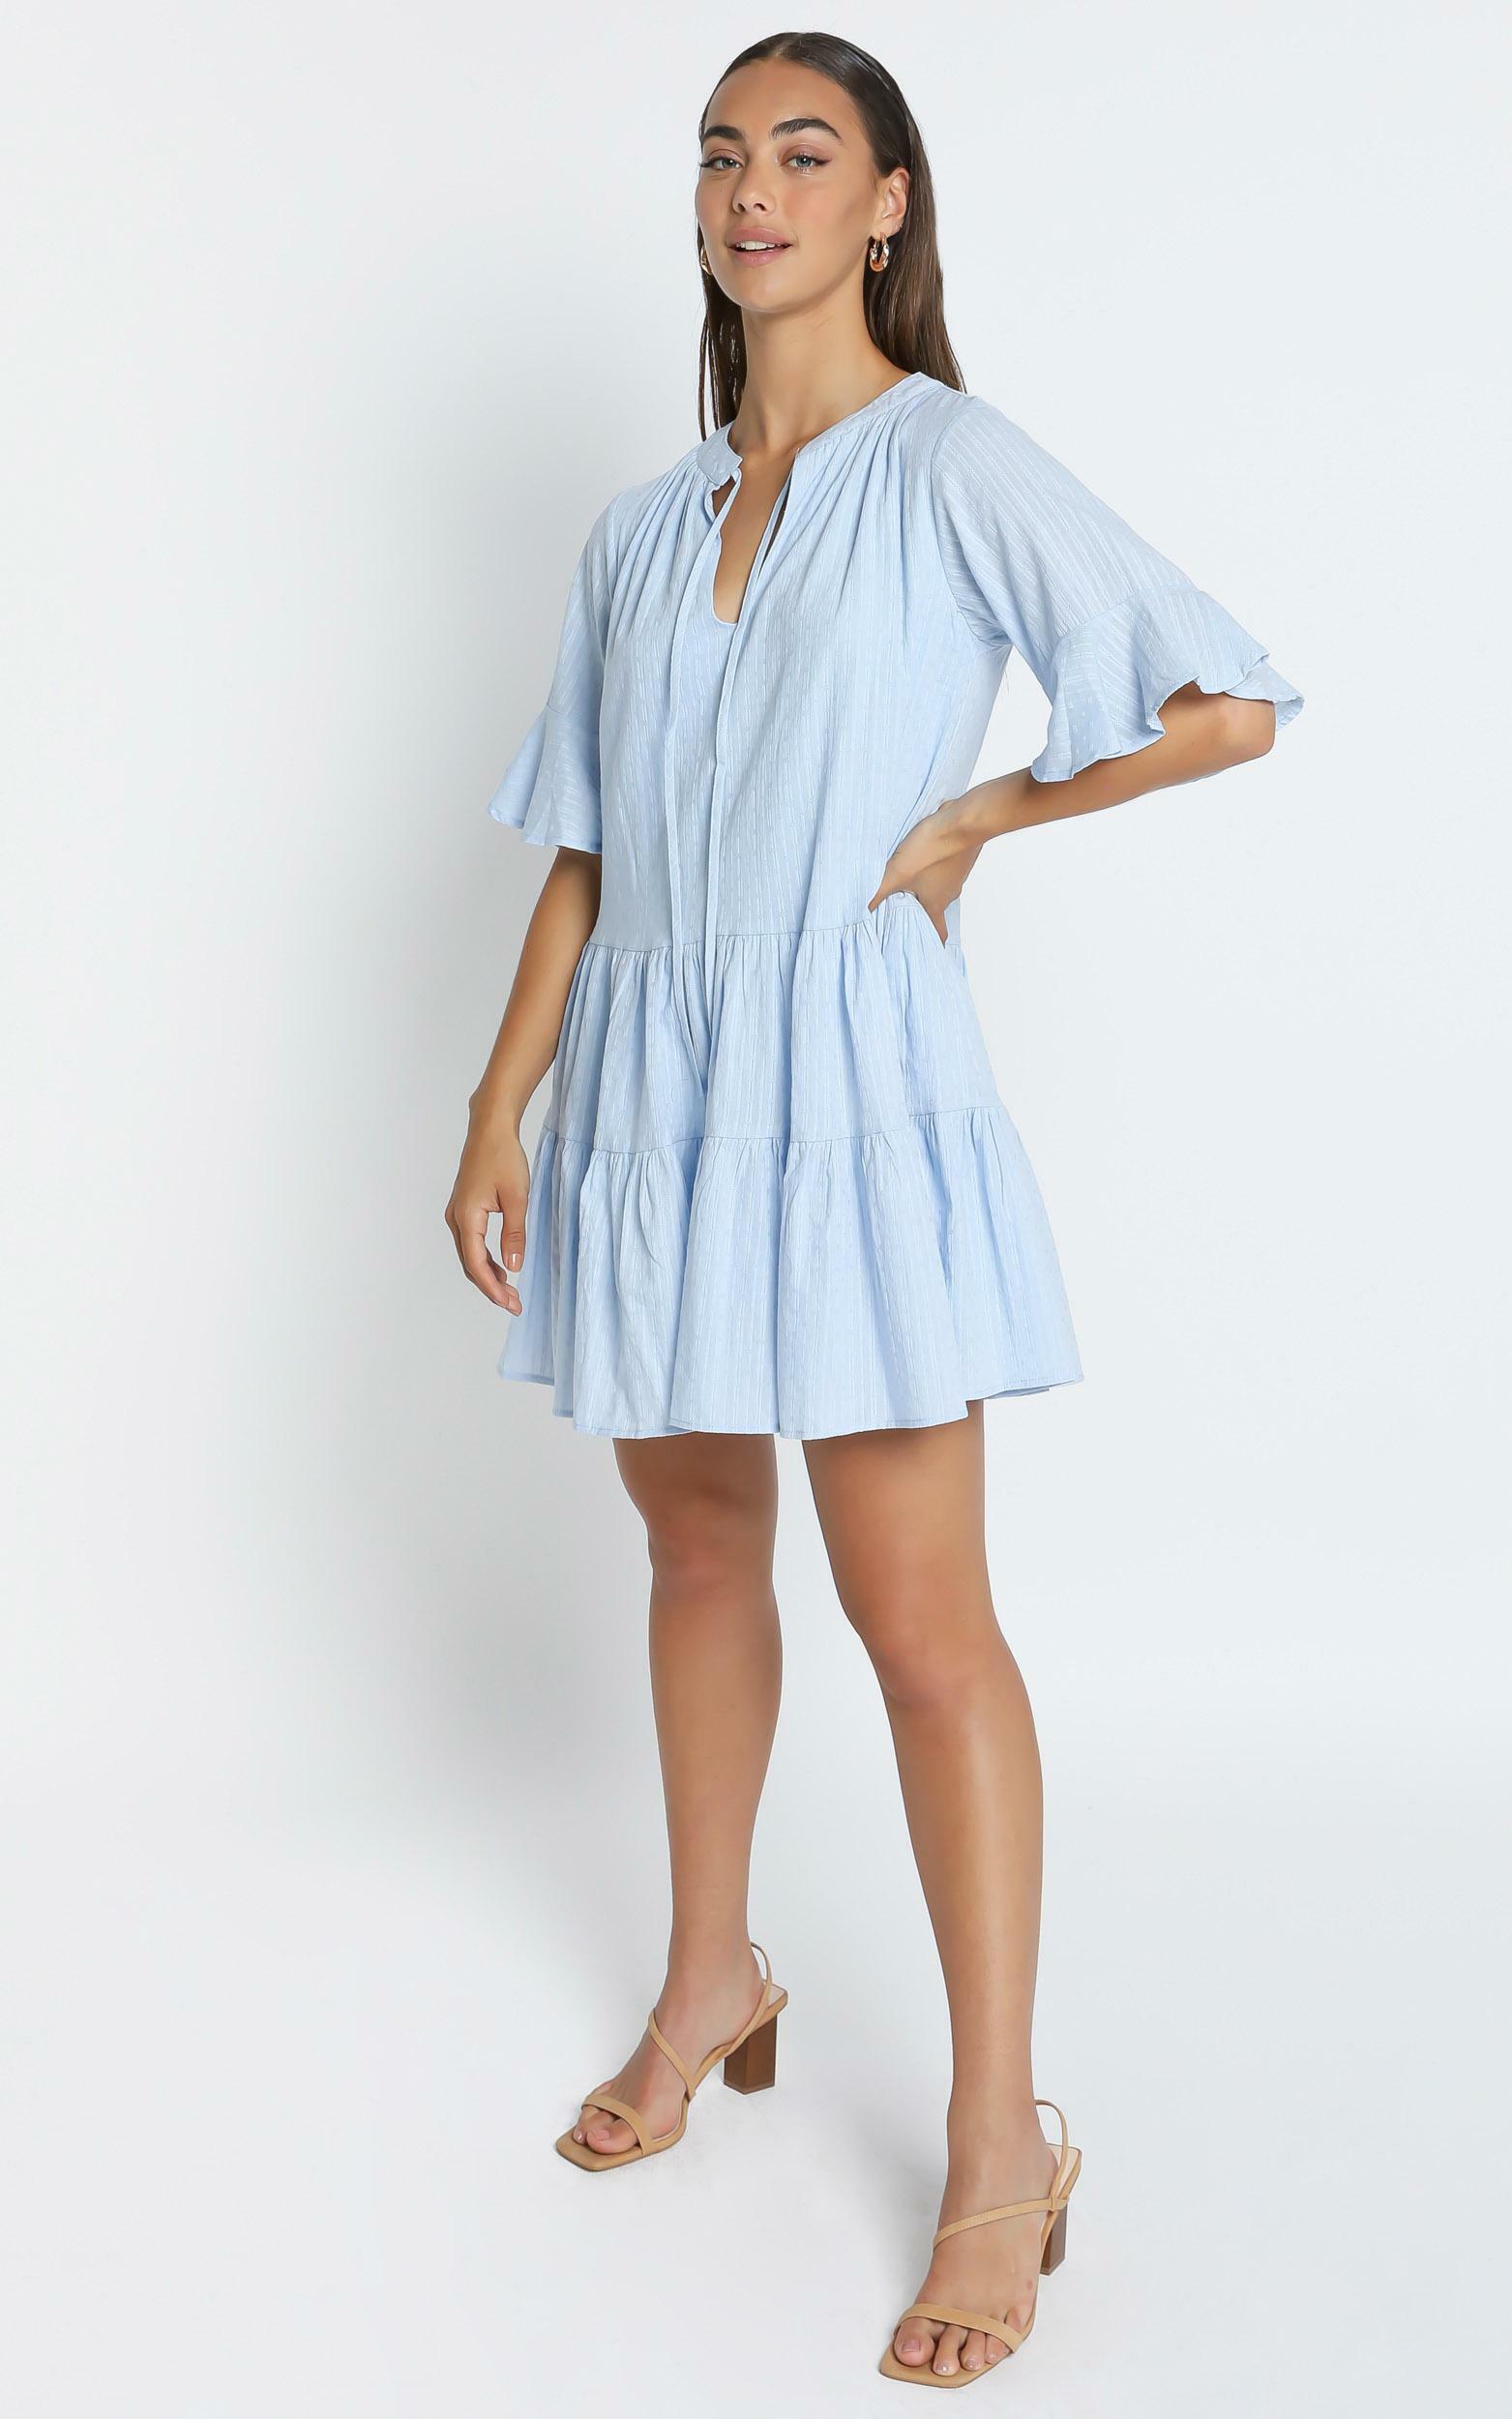 Best Memories Dress In Blue - 6 (XS), Blue, hi-res image number null